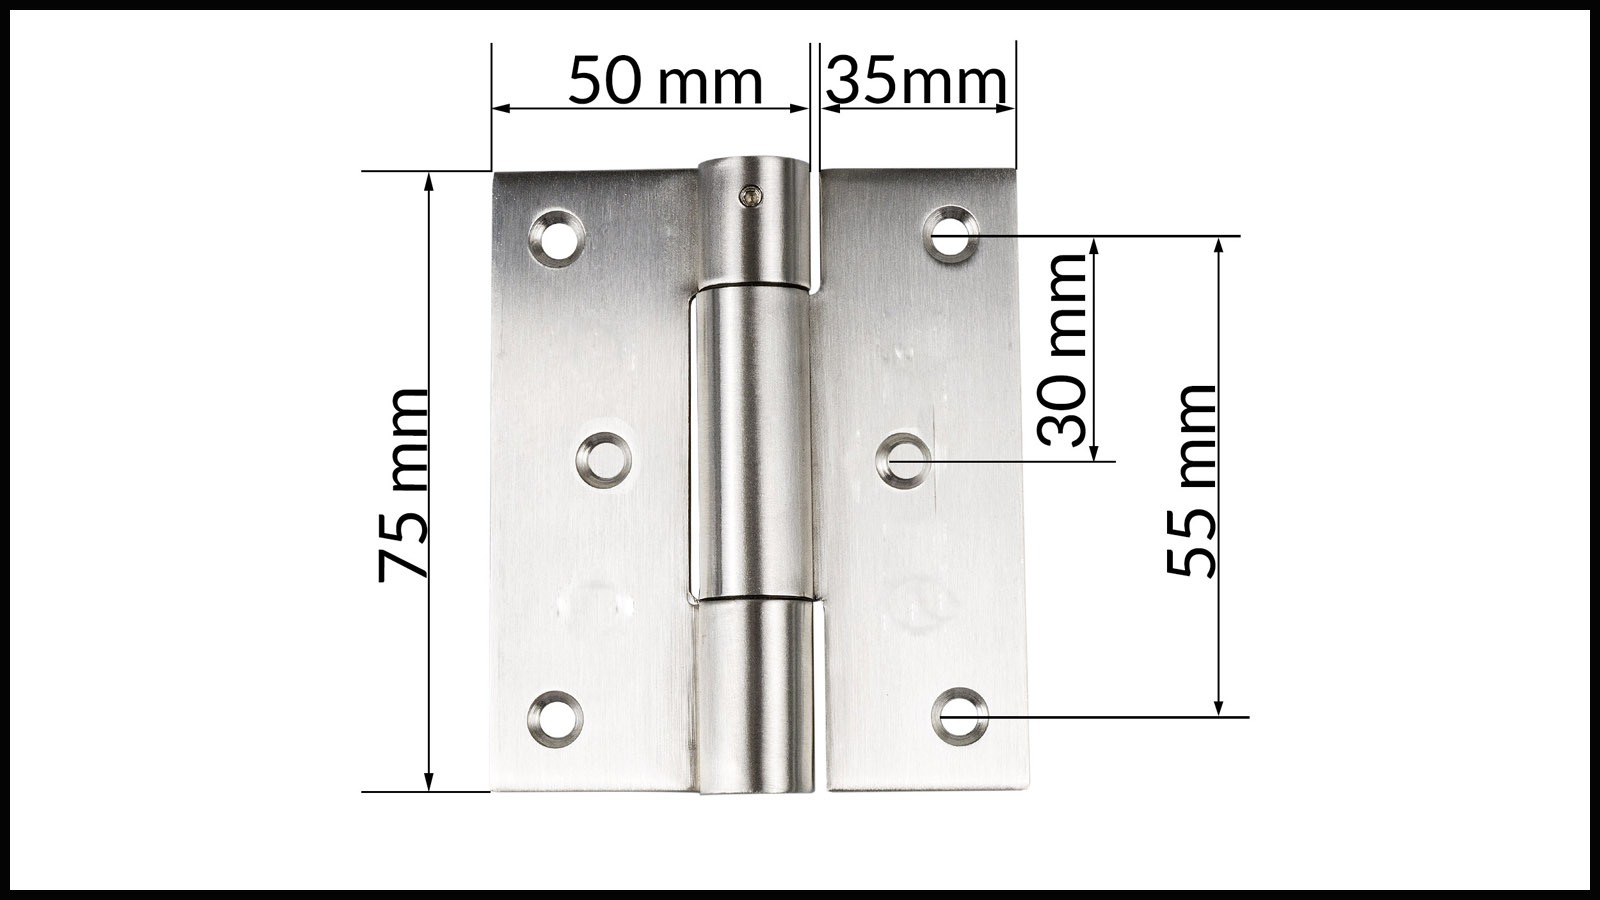 2 acier inoxydable 125 mm Türband CHARNIERE Charnière en Acier inoxydable charnière saisir